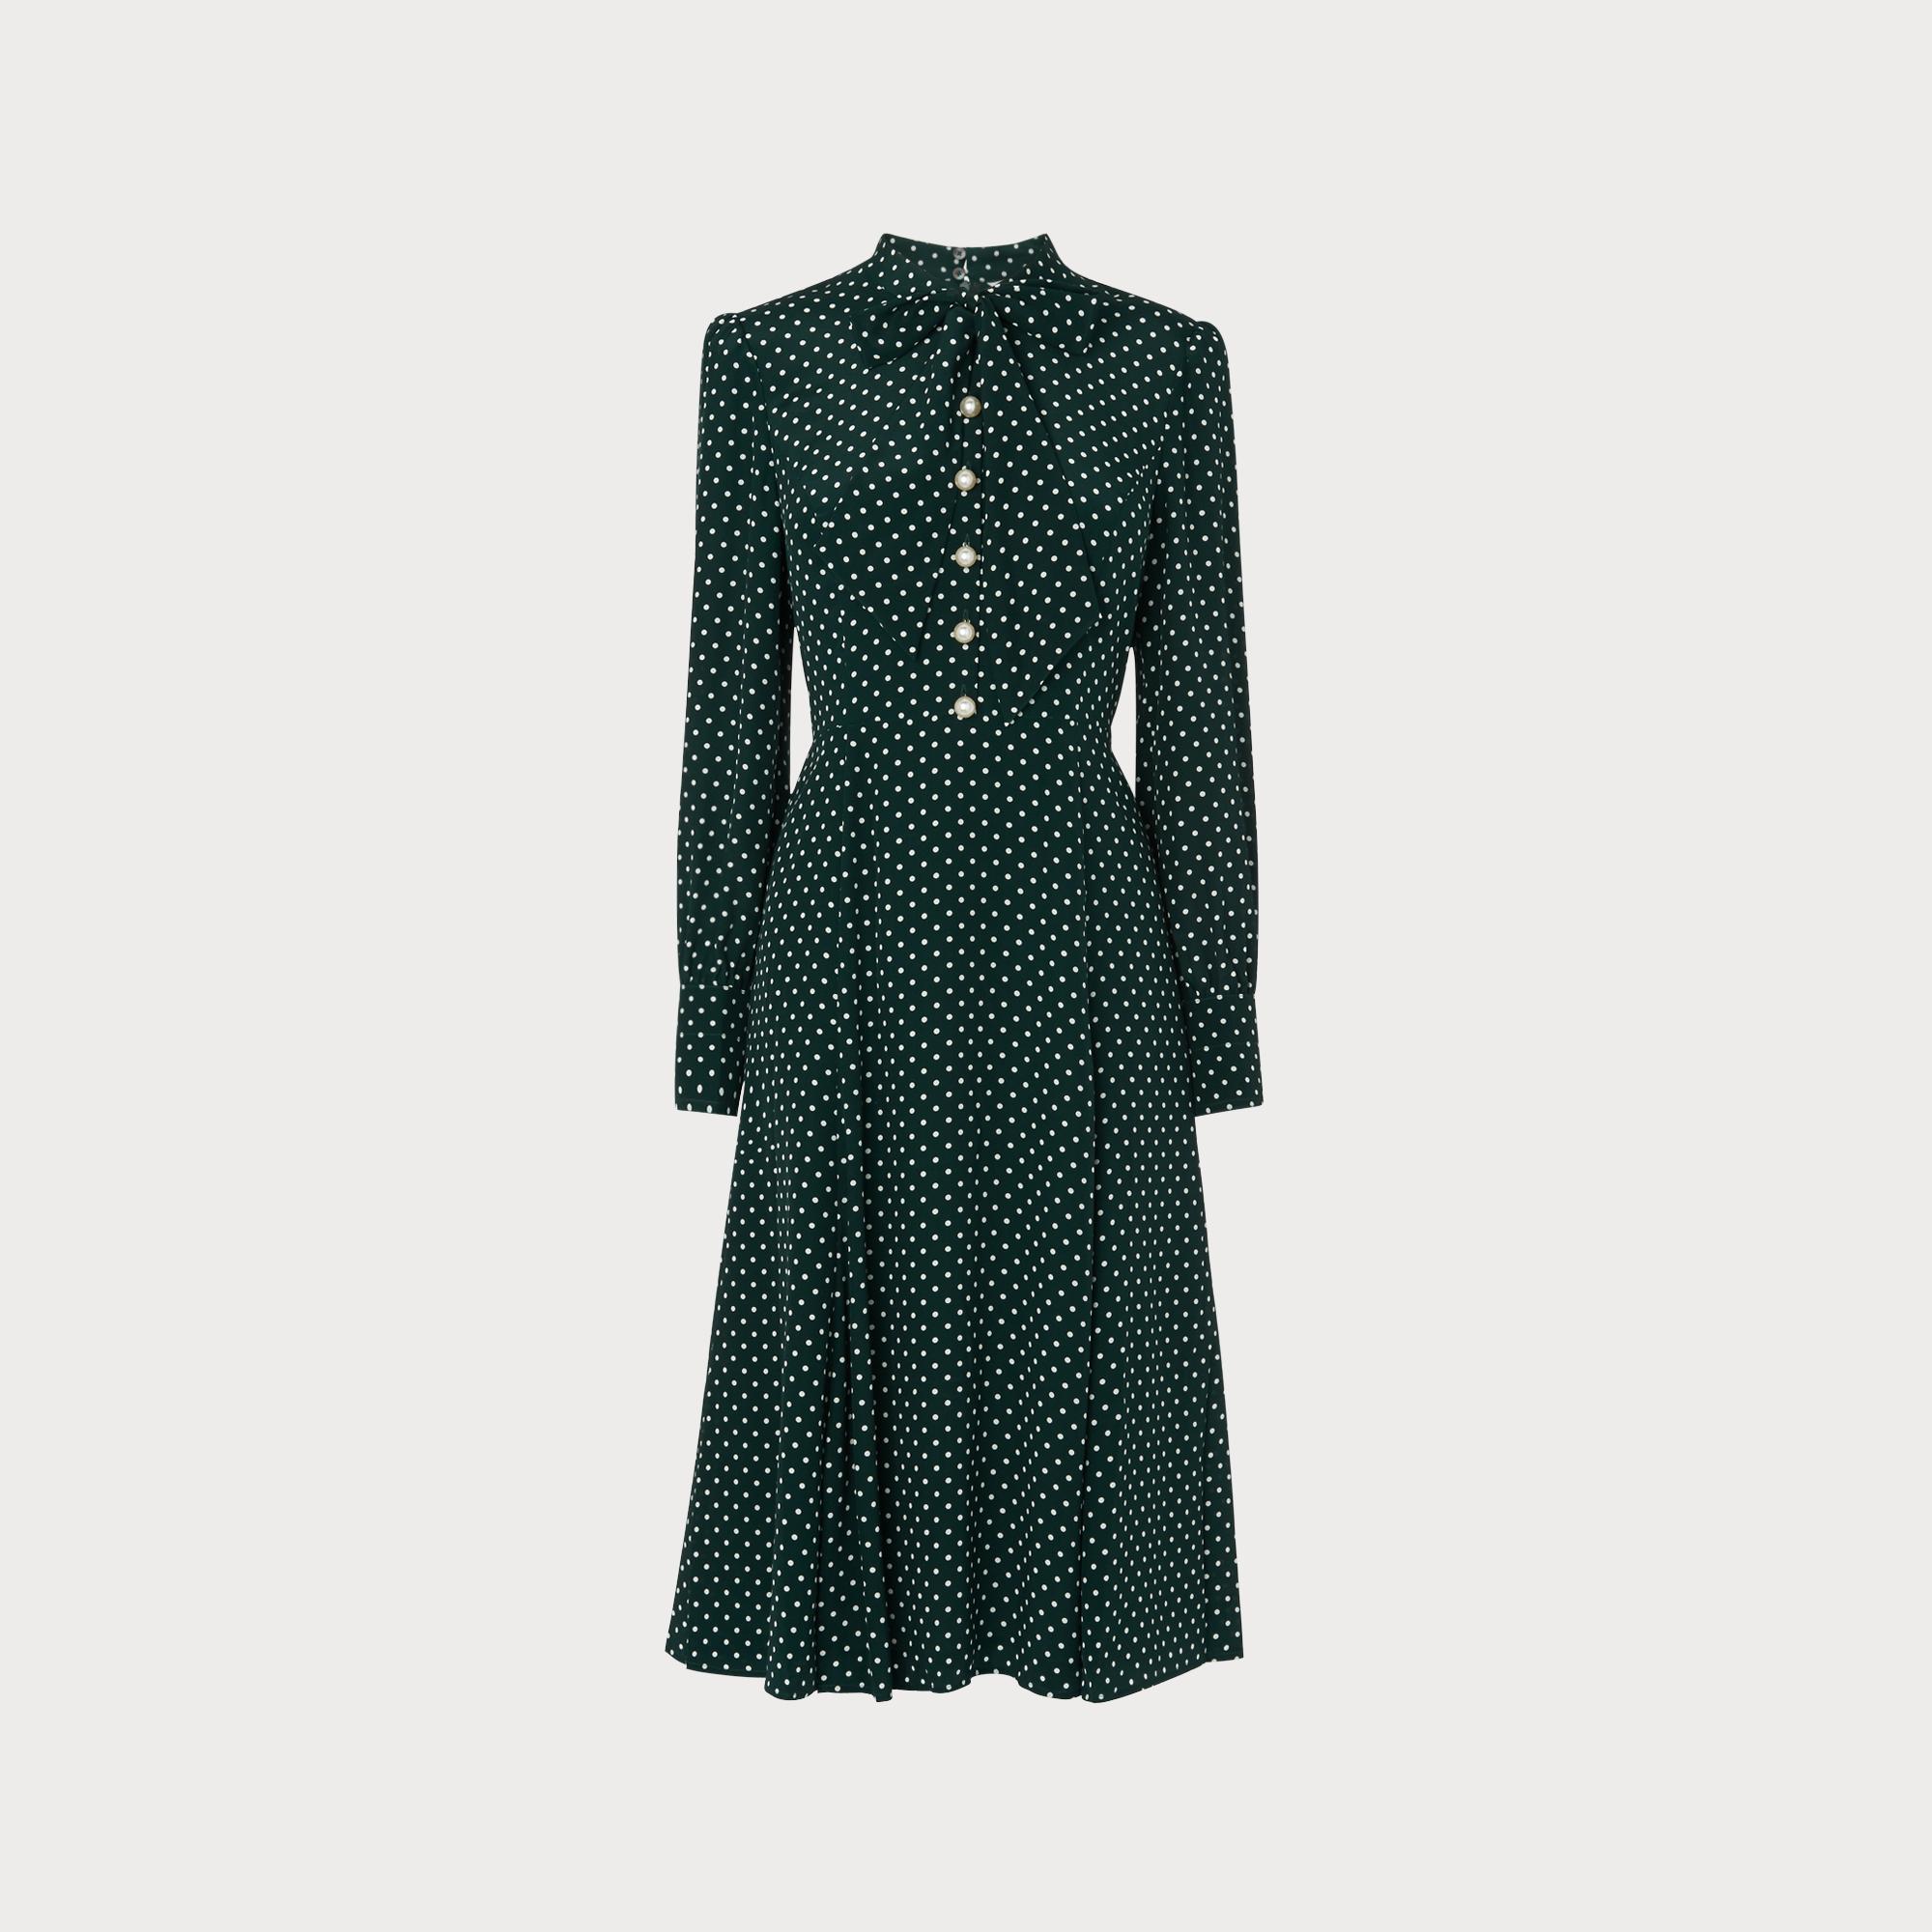 a9443279c0 Mortimer Green Polka Dot Silk Dress